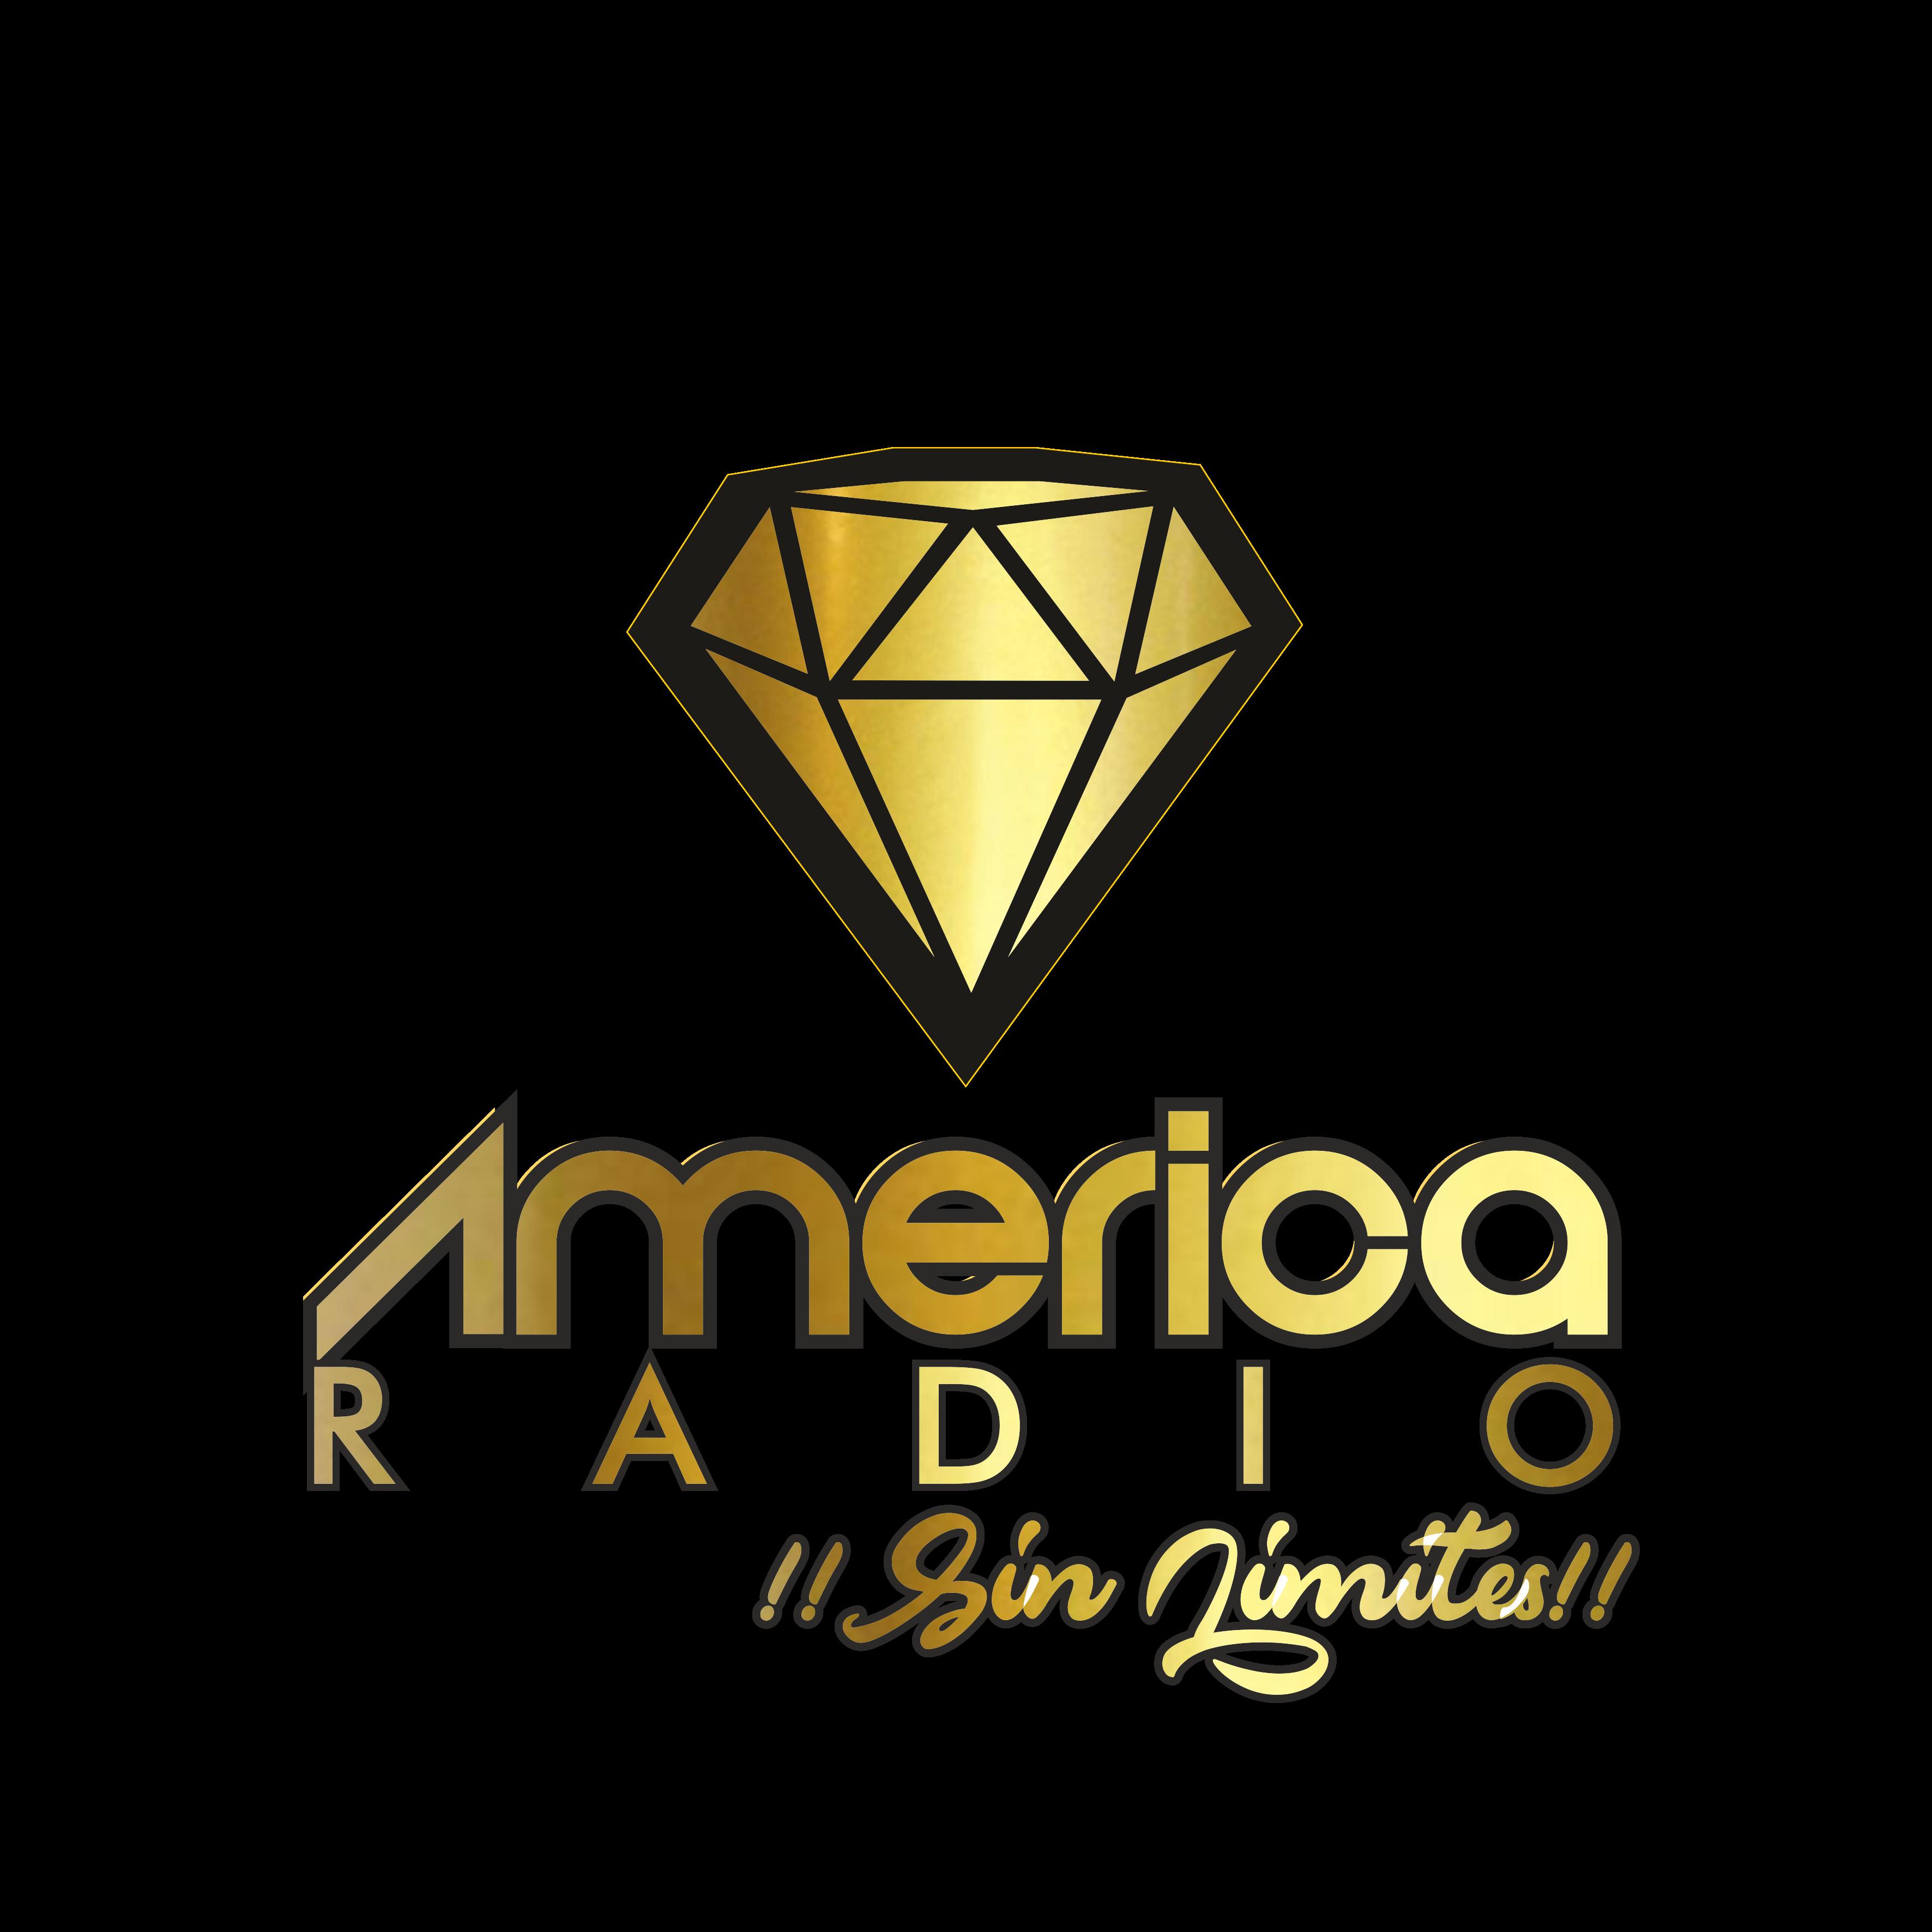 AMÉRICA RADIO